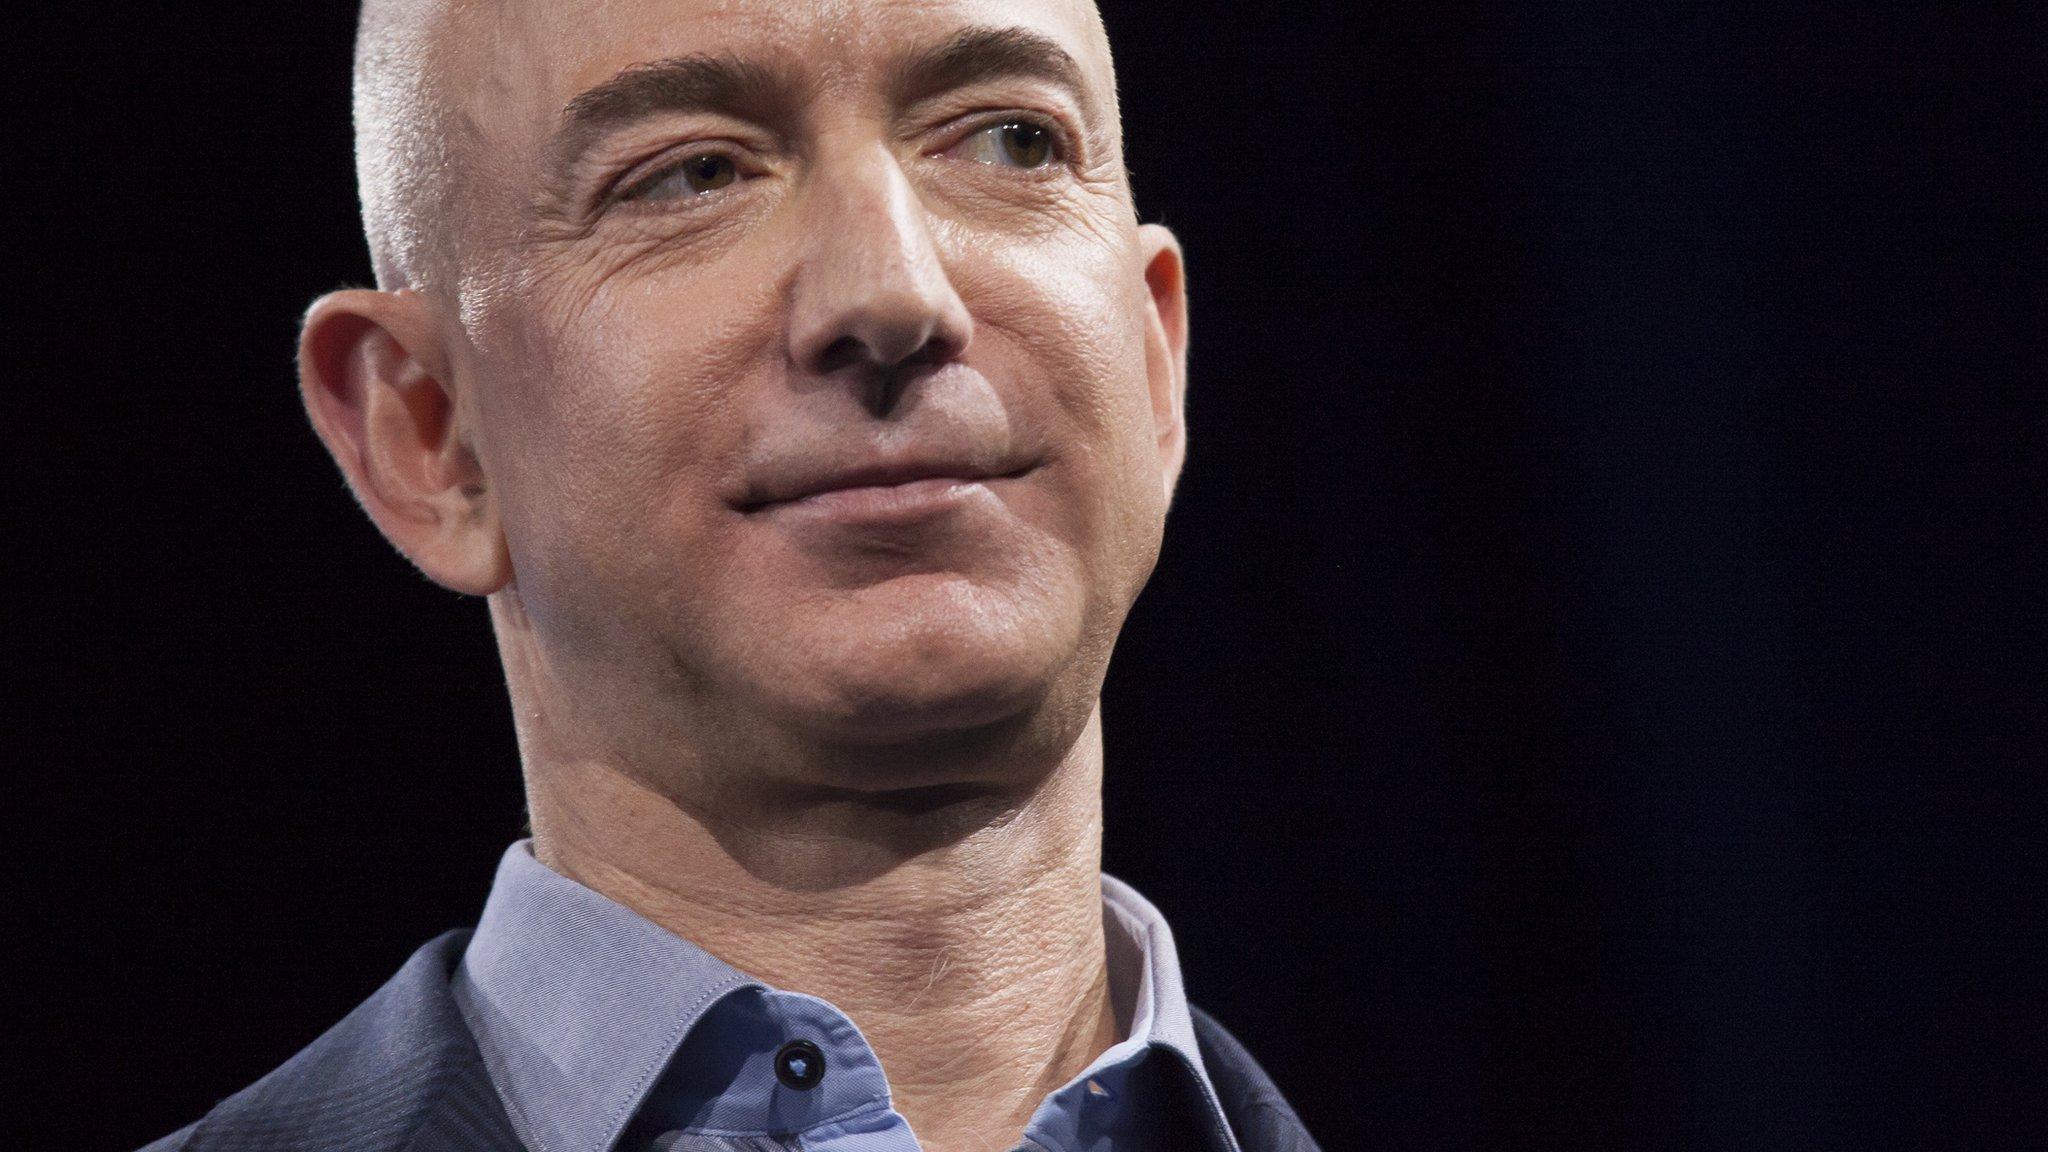 Amazon's Jeff Bezos beats Bill Gates in new rich list